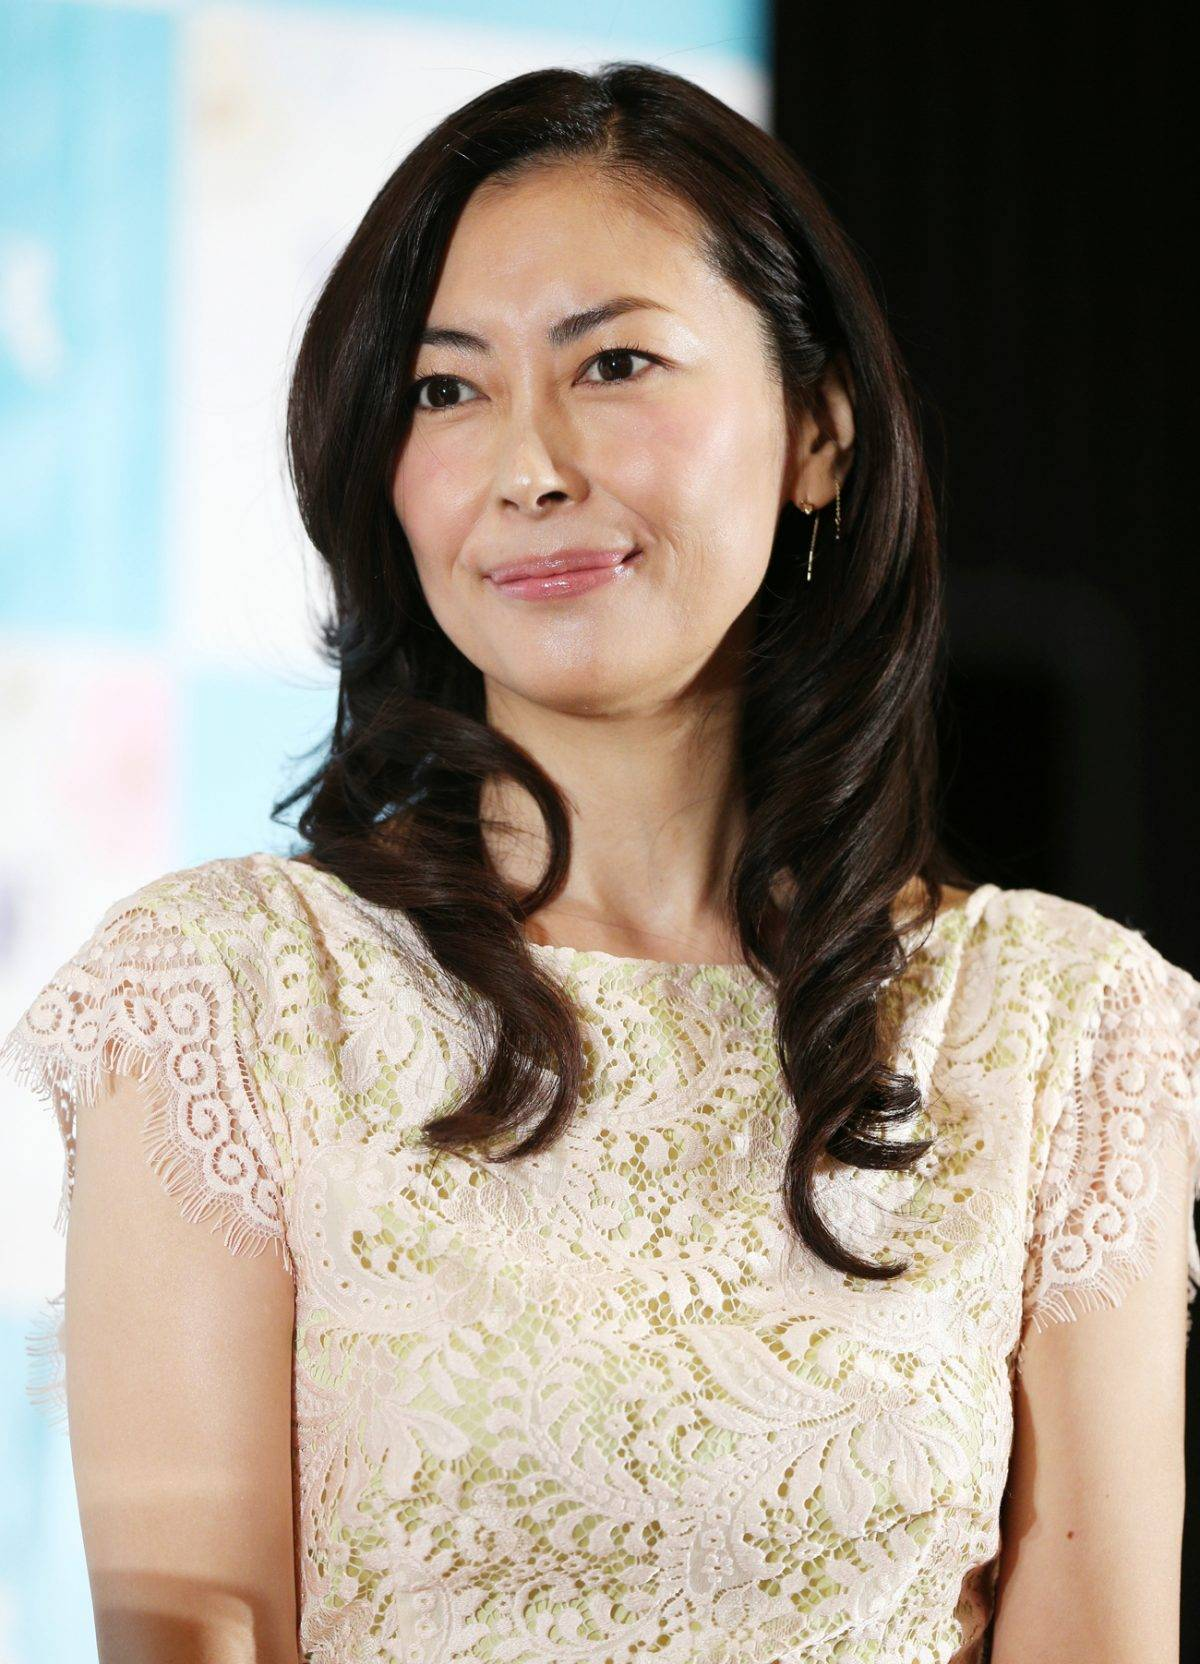 Communication on this topic: Elizabeth Patterson (actress), miho-nakayama/